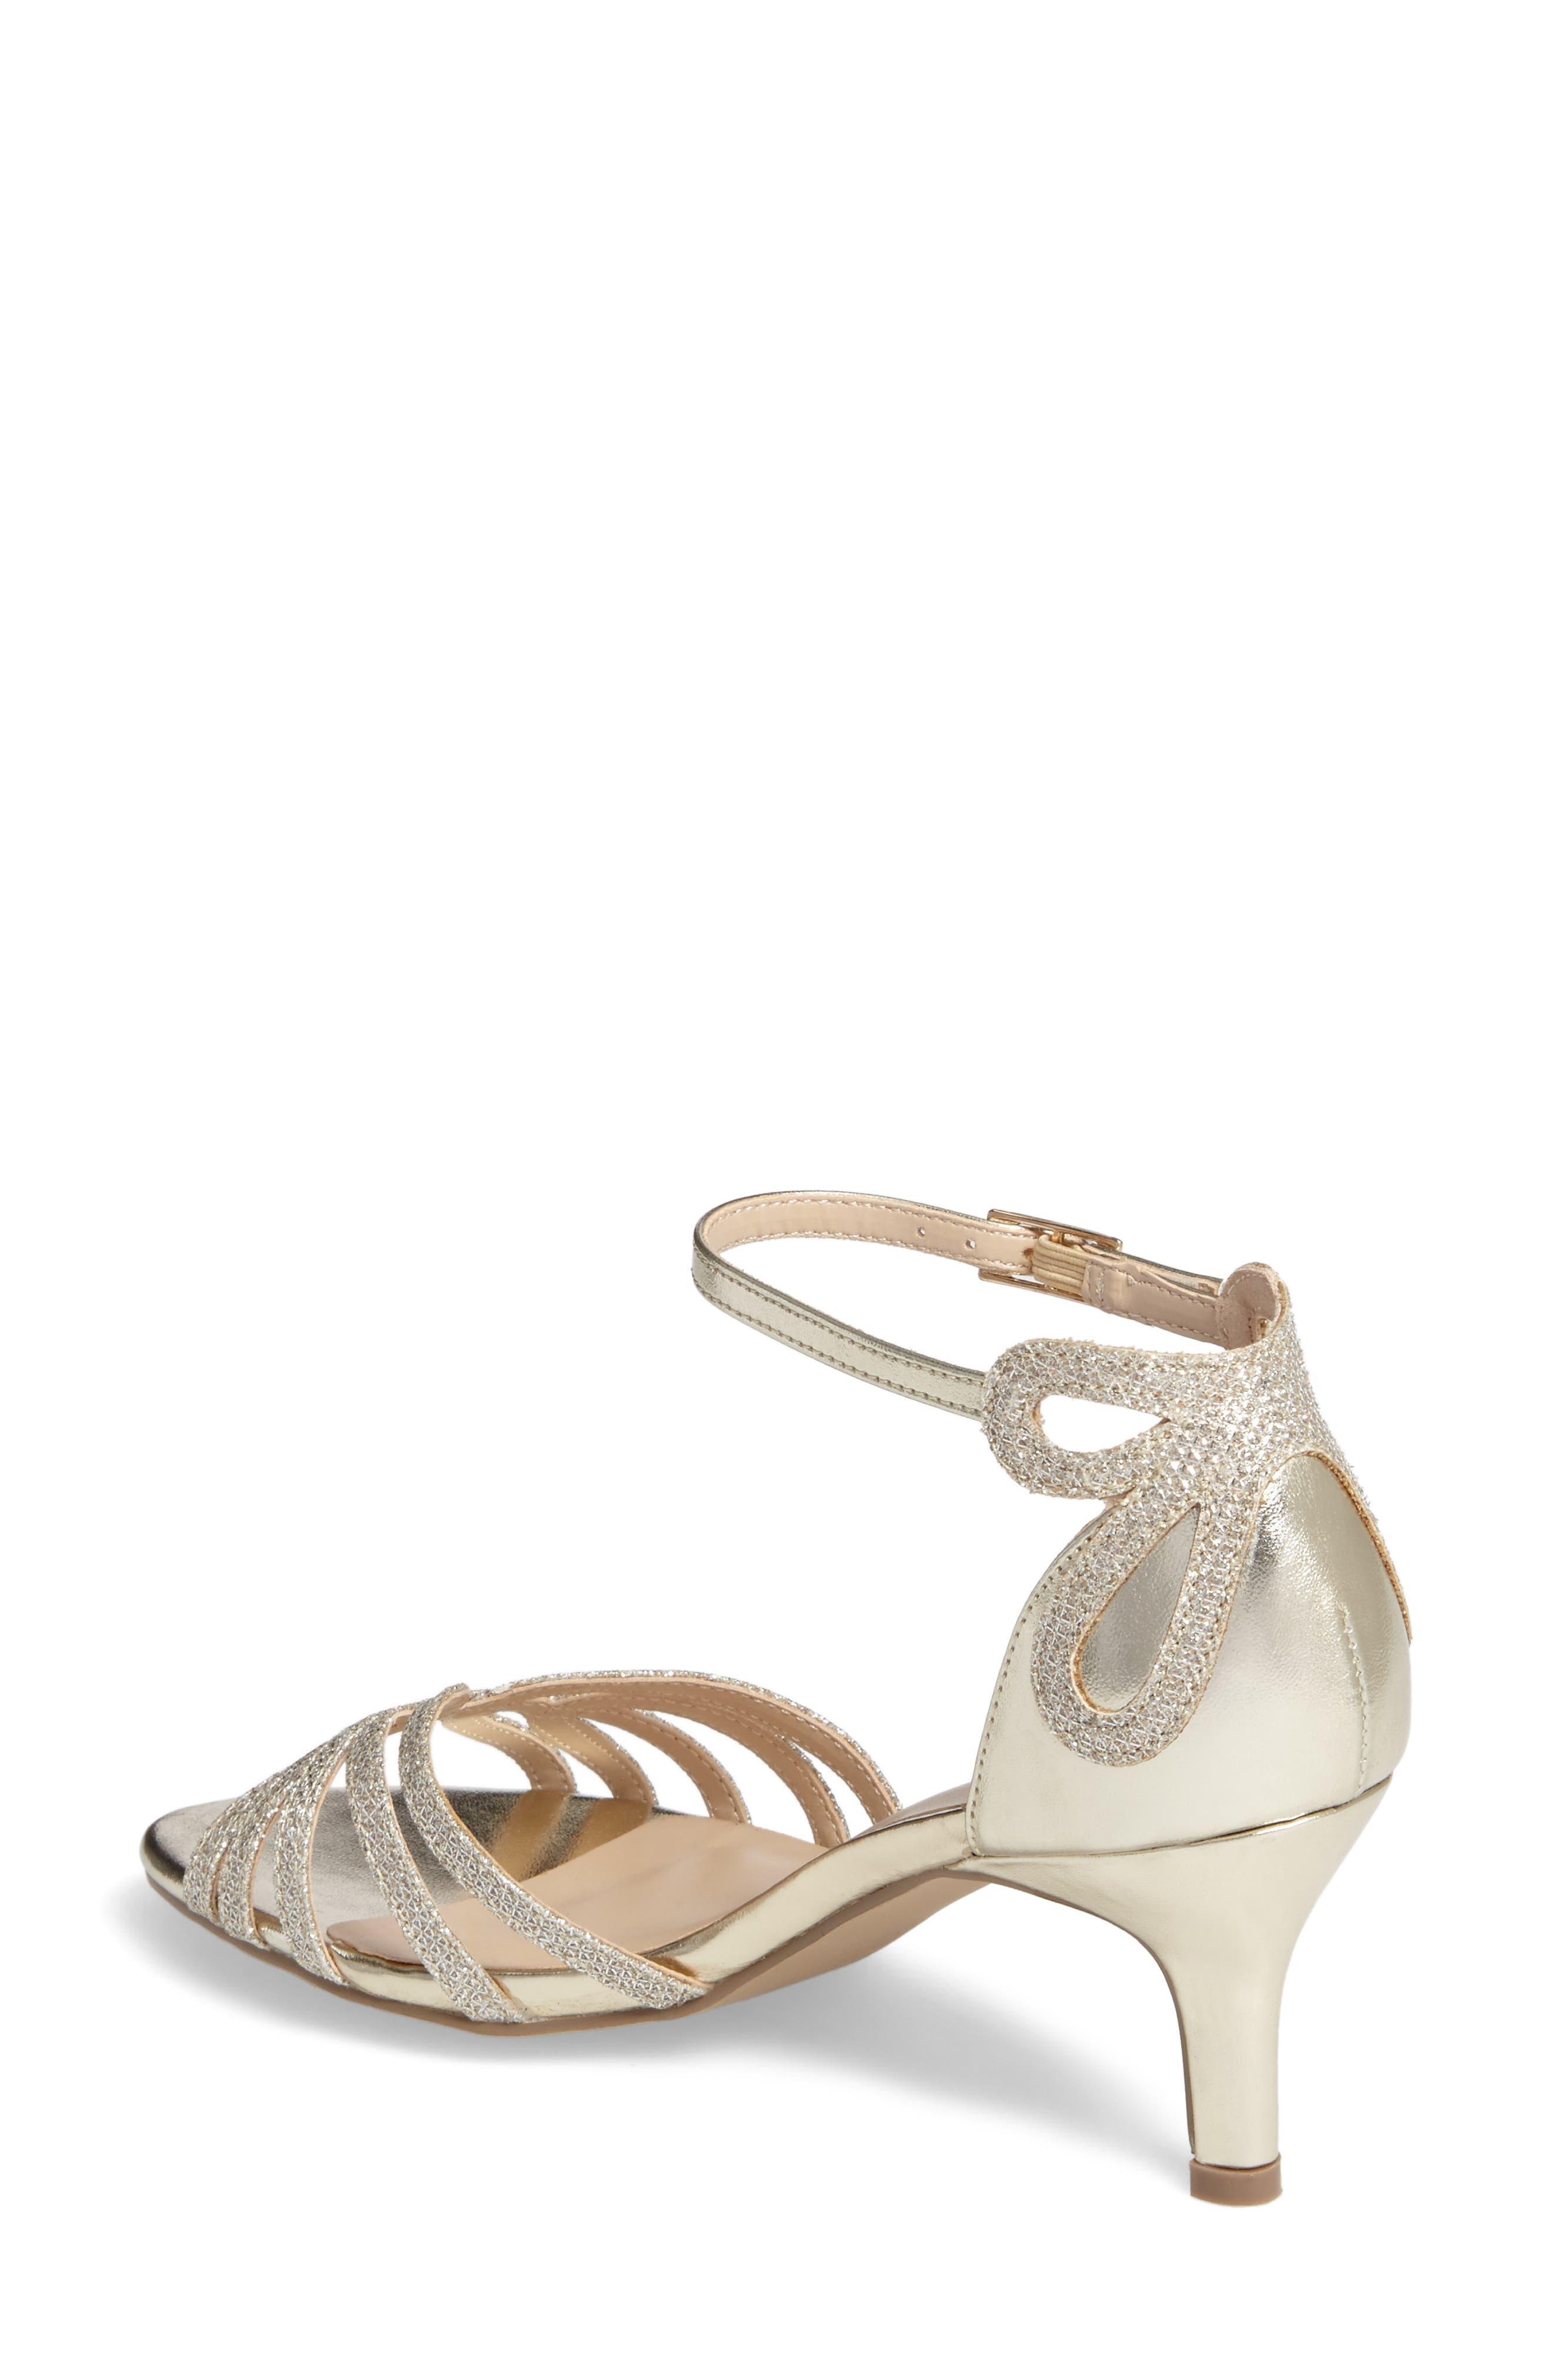 Melby Ankle Strap Sandal,                             Alternate thumbnail 2, color,                             Champagne